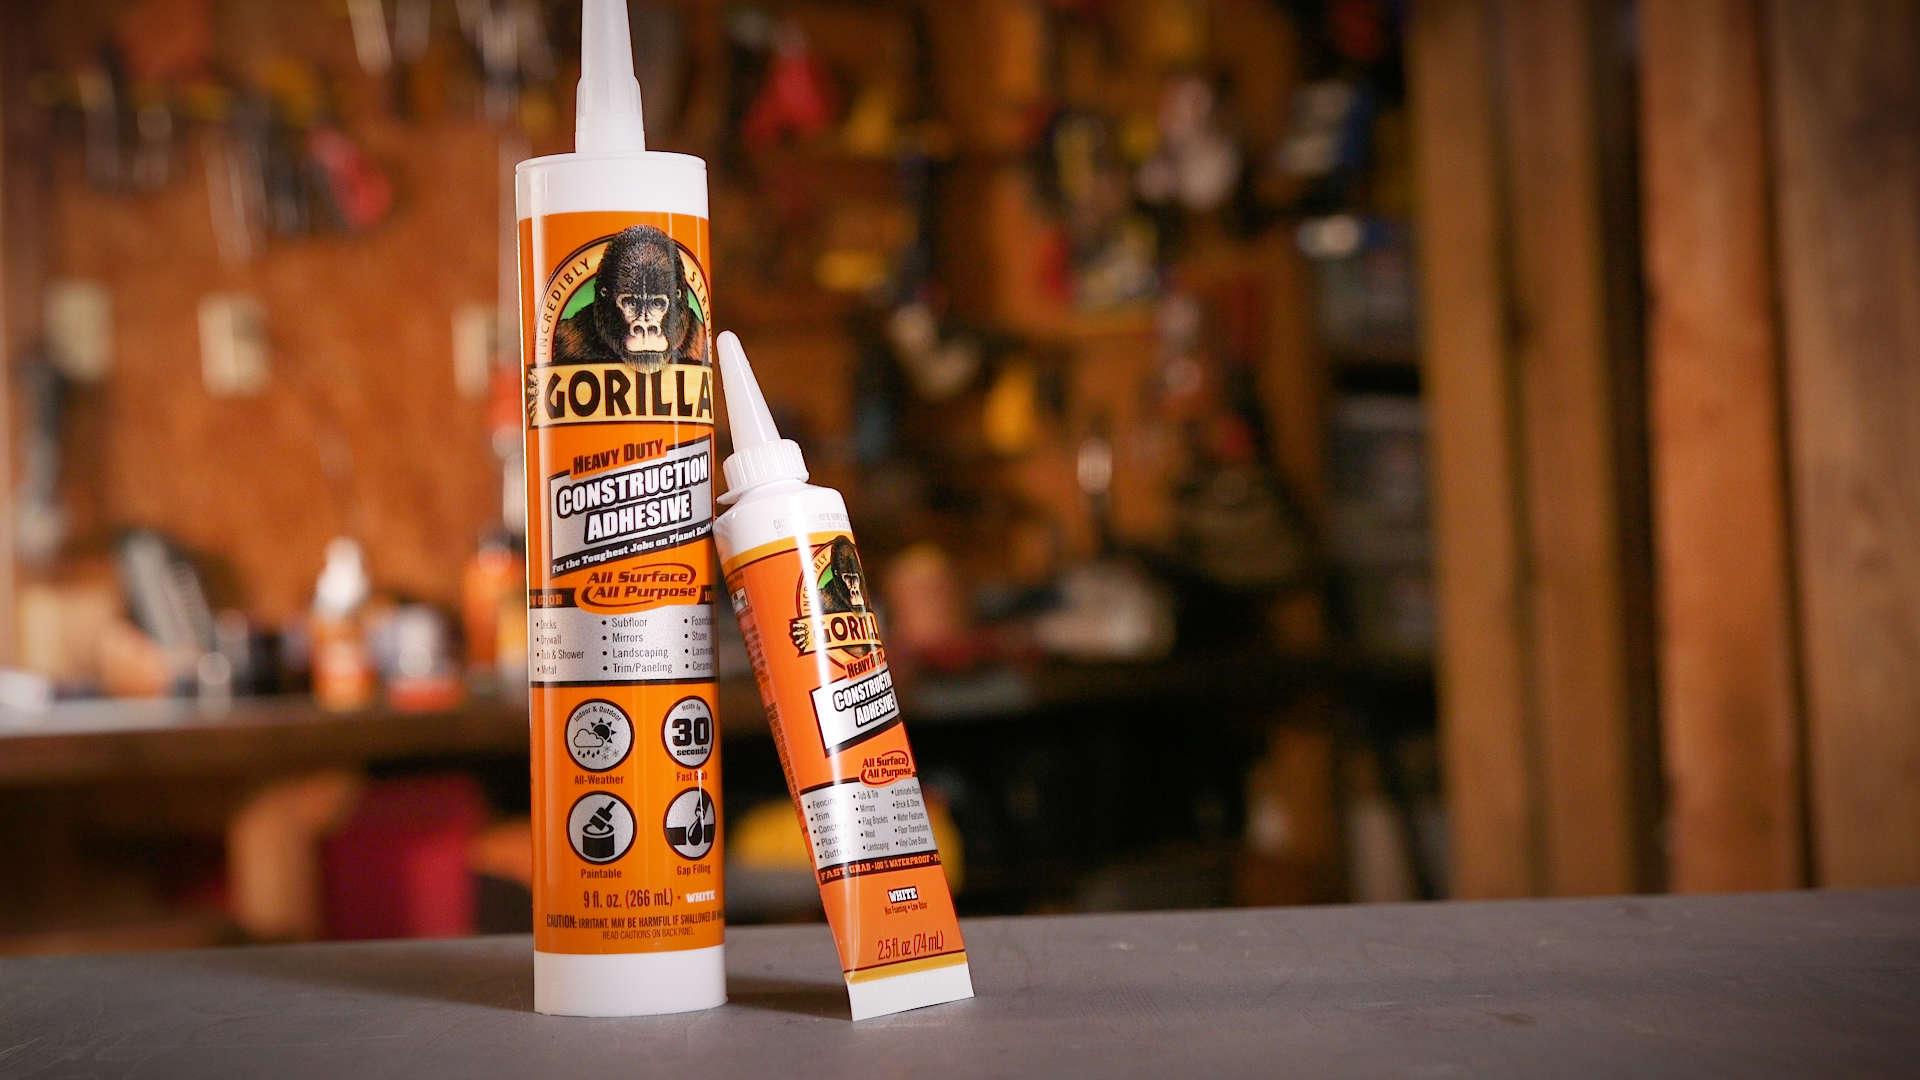 Gorilla Construction Adhesive Gorilla Glue